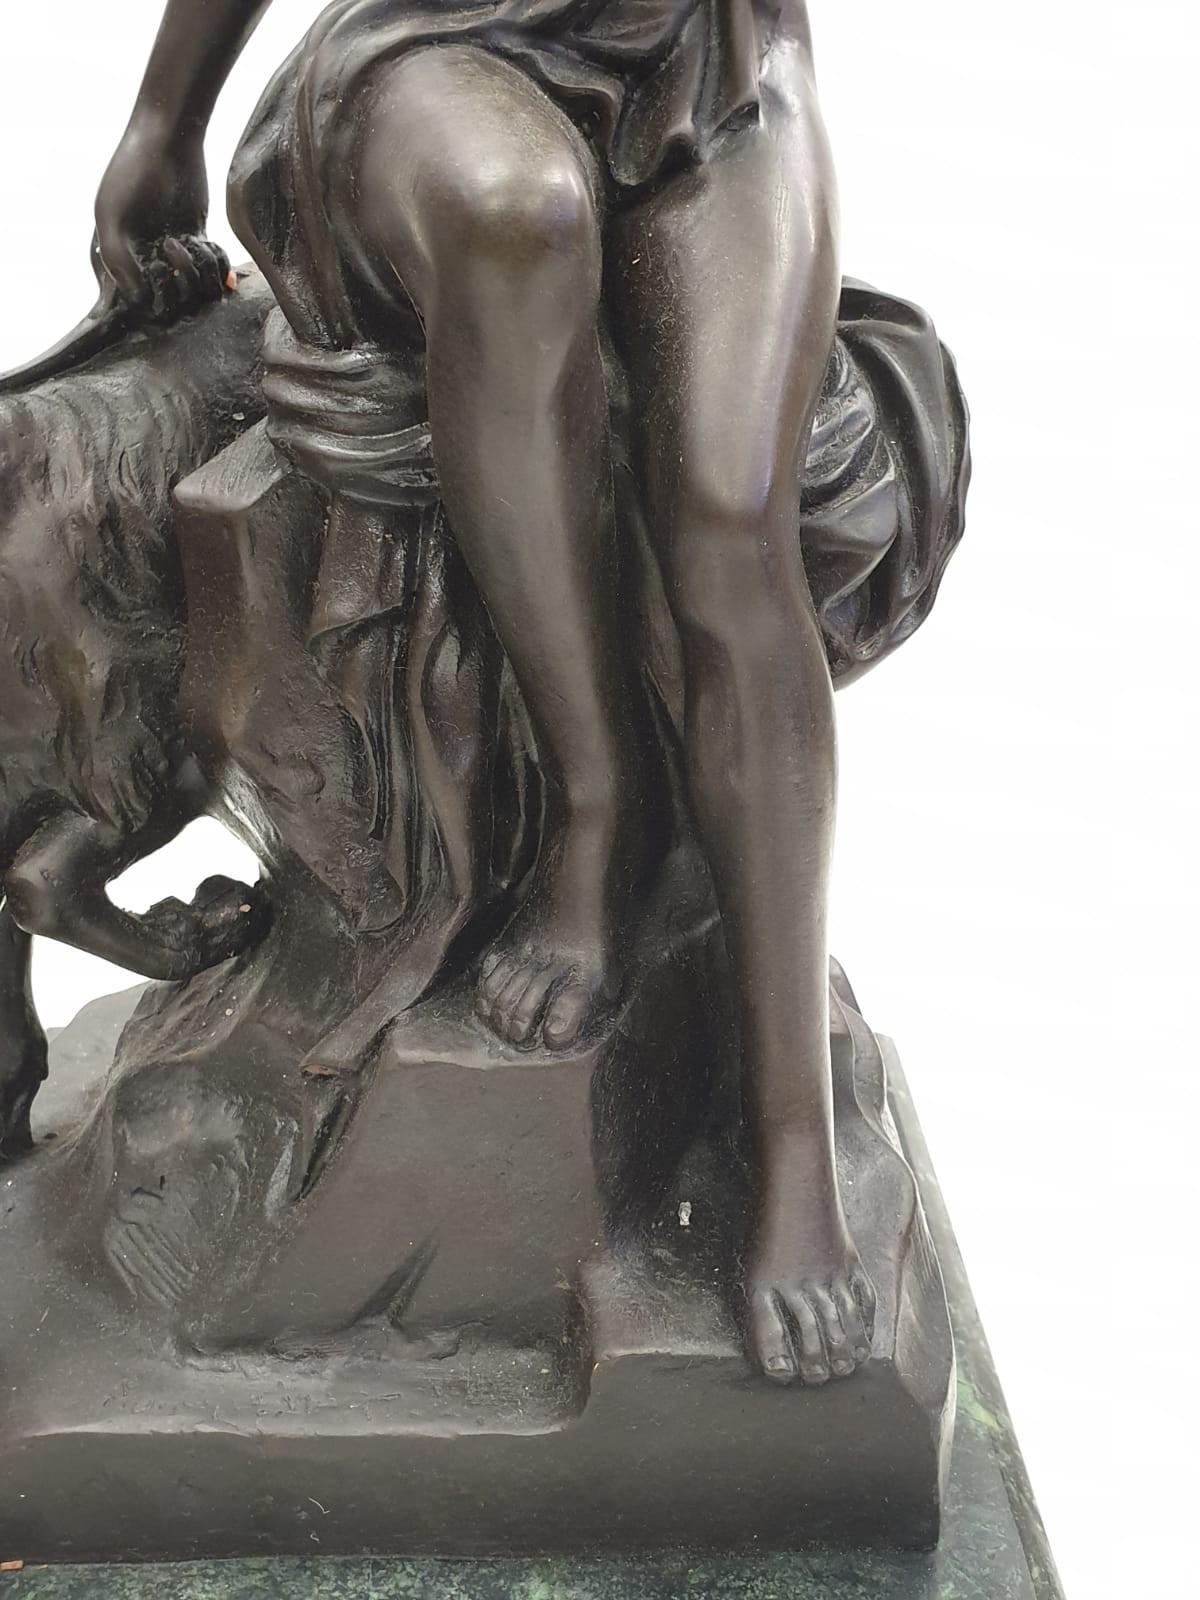 Bronze Pierre Julien figurine on plinth. 'Amalthea and Jupiter's Goat'. Height 45cm. Weight 9.7kg - Image 6 of 27